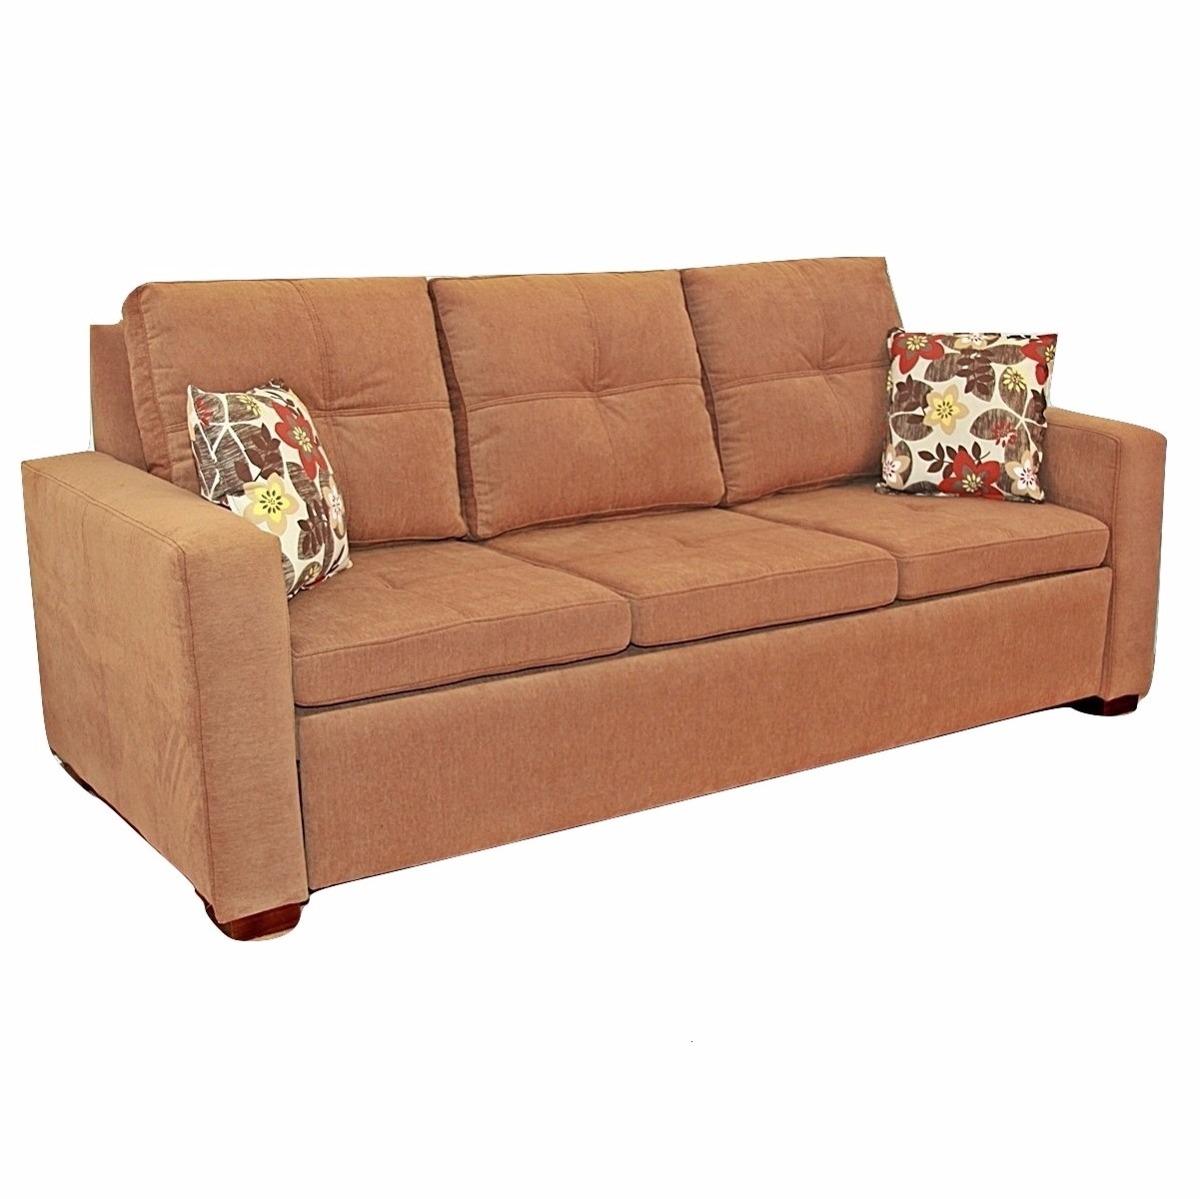 ef25a5ad8c9 Sill n sof cama 3 cuerpos cama 2 plazas modelo mallorca for Sofa cama  plegable 2